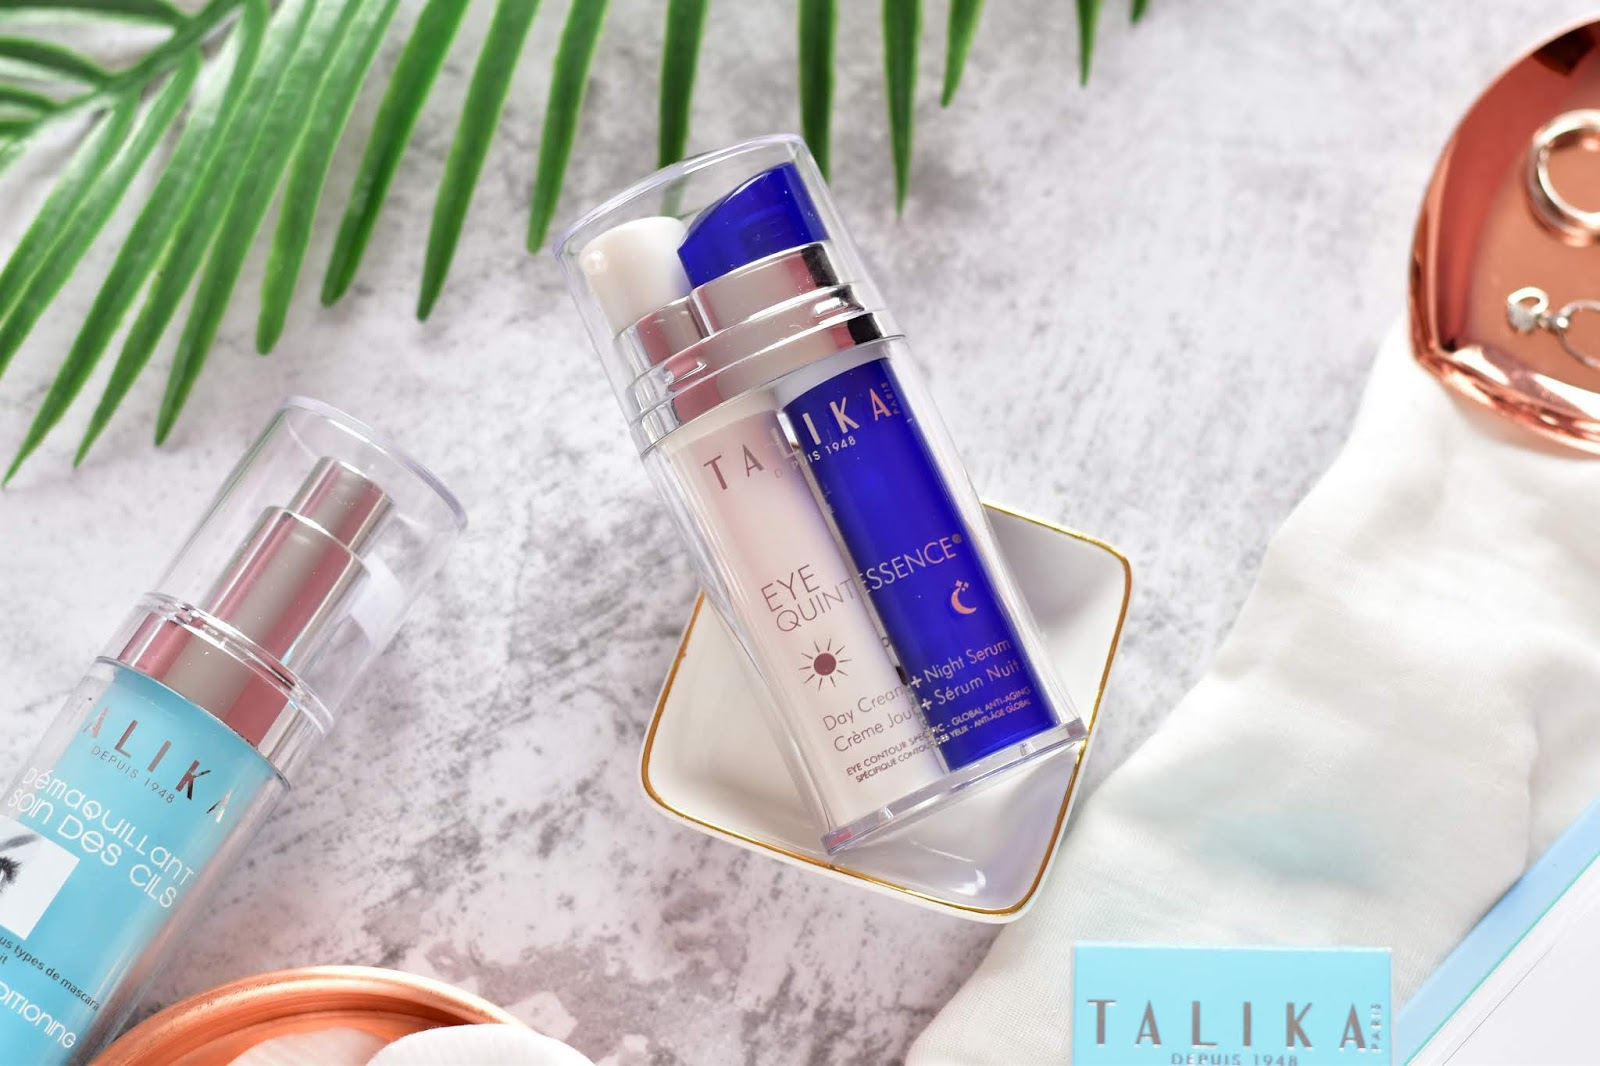 Talika Eye Essence